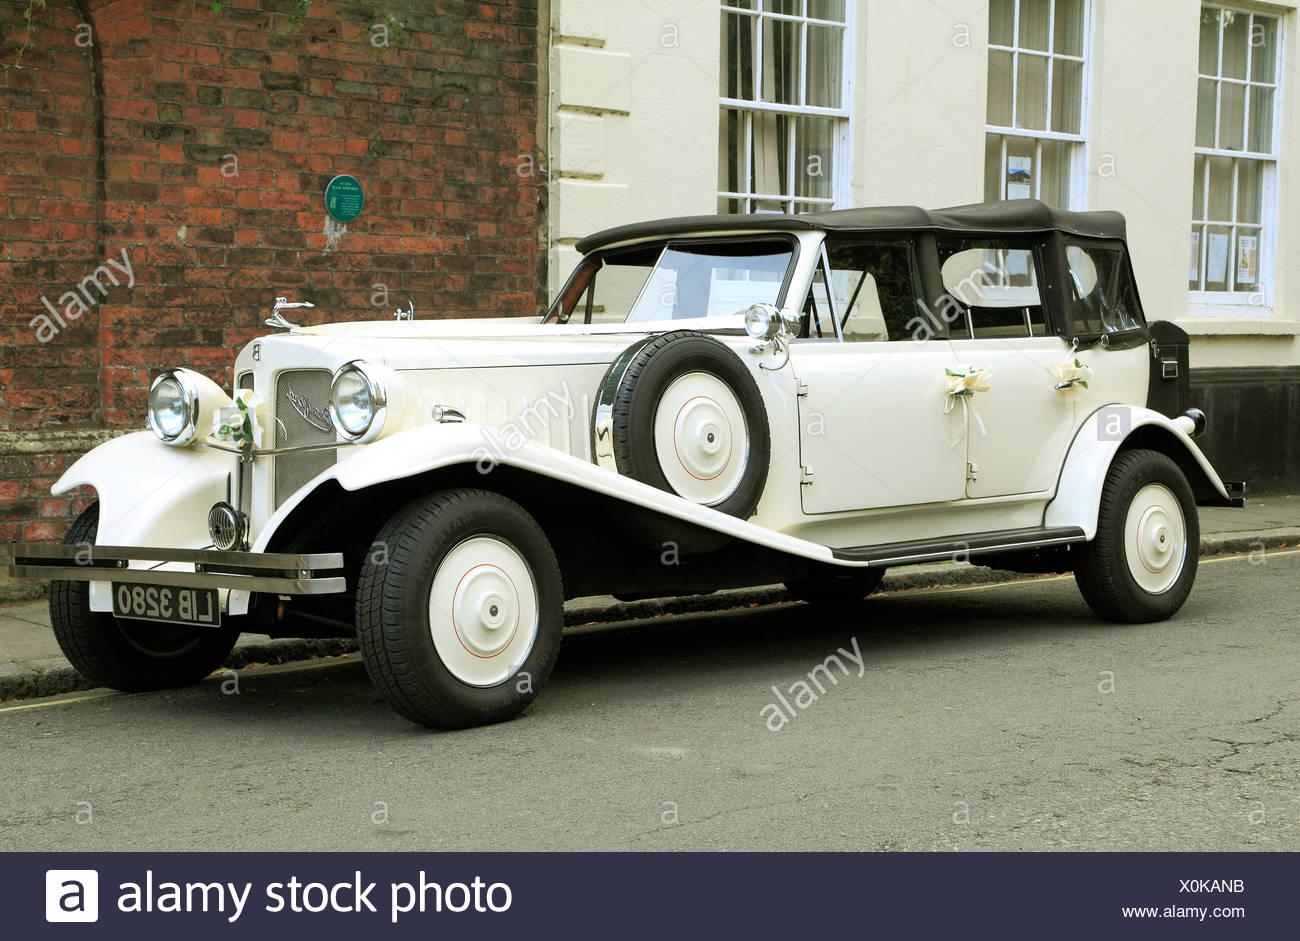 Suite nuptiale mariage Vintage automobile voiture voitures automobiles Beauford, Photo Stock